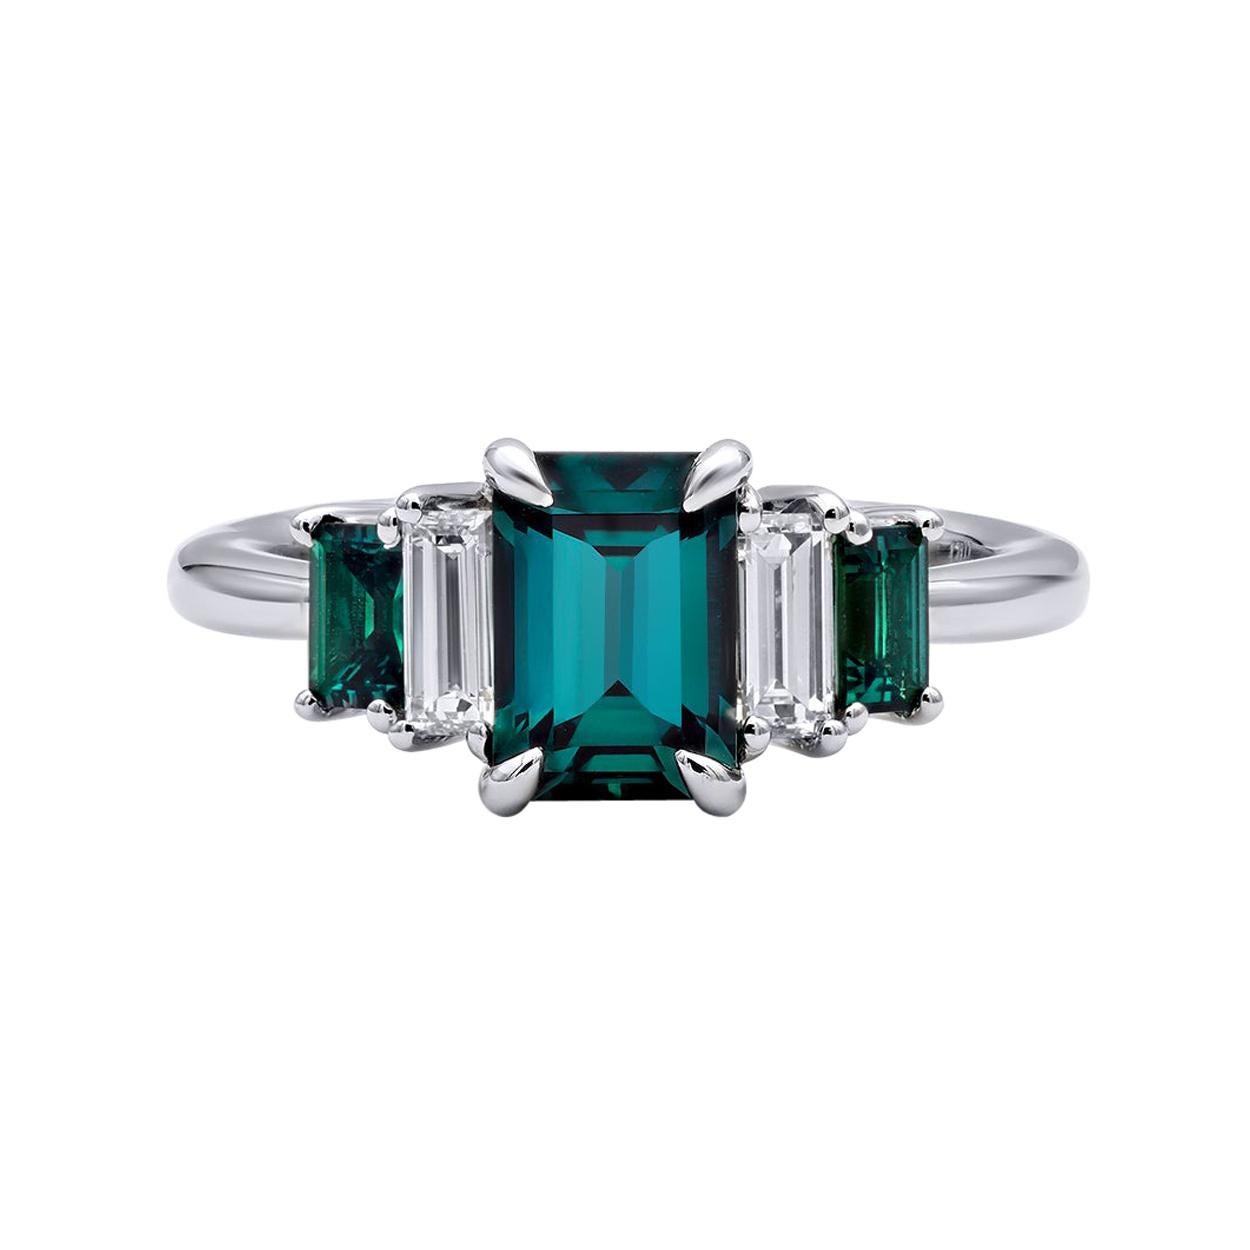 Mark Henry 1.74 Carat Natural Brazilian Alexandrite and Diamond Ring, 18 Karat